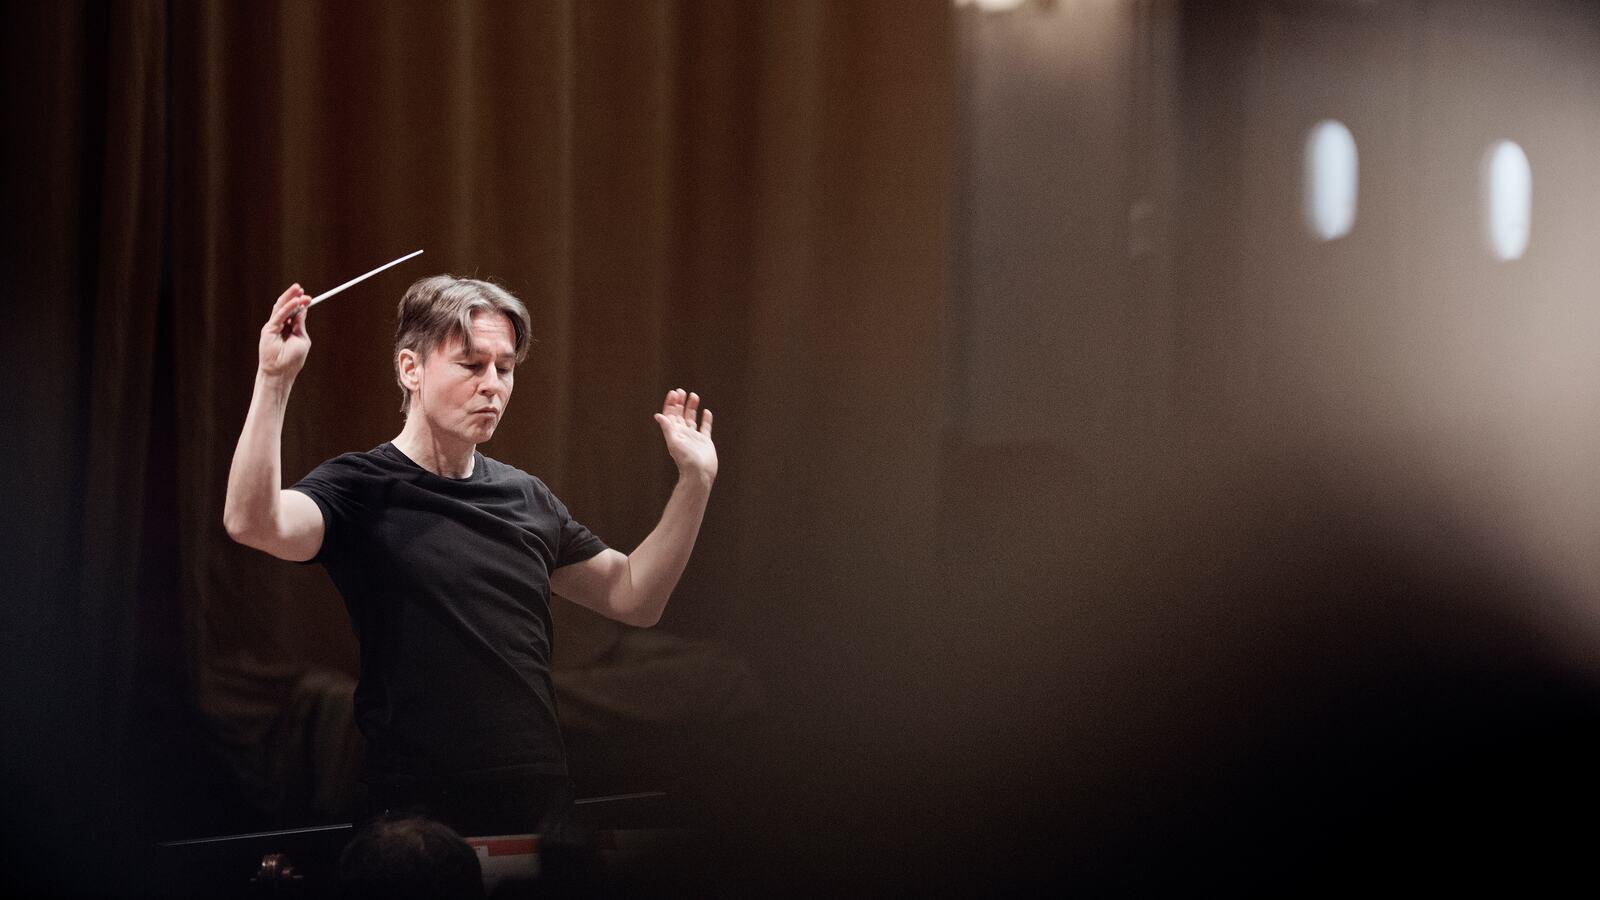 Esa-Pekka Salonen, conductor